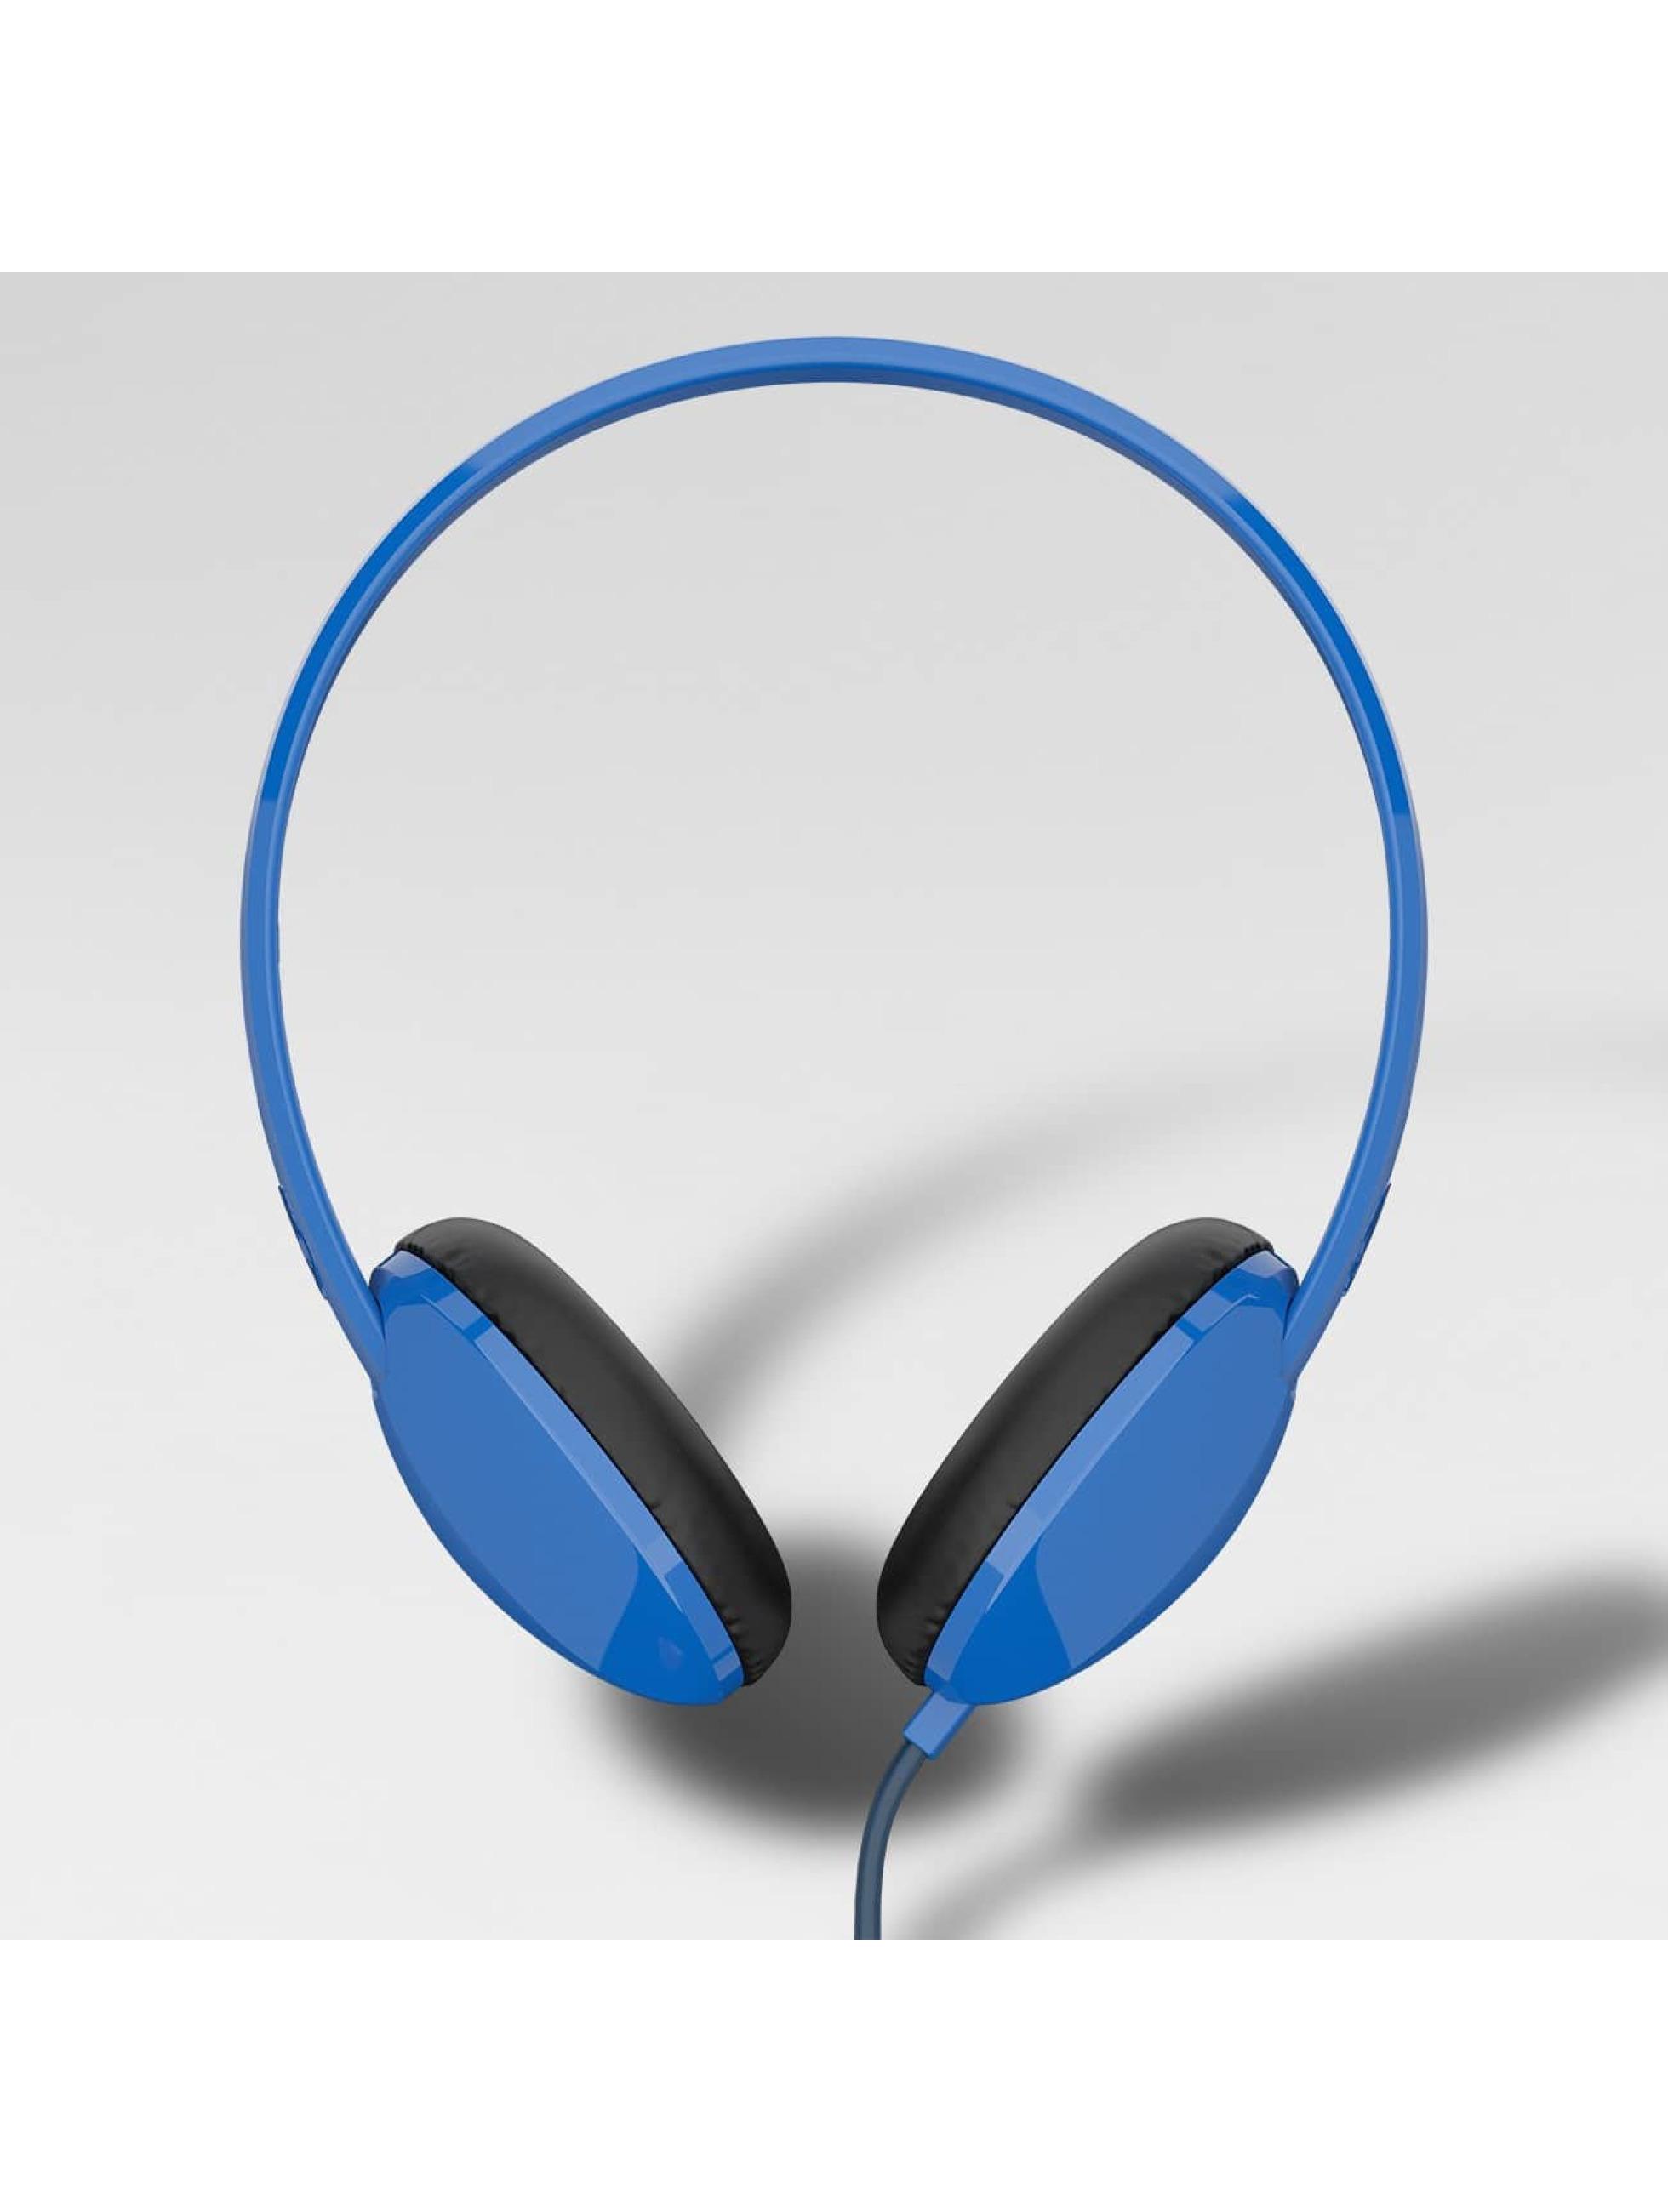 Skullcandy Auriculares Stim Mic 1 On Ear azul